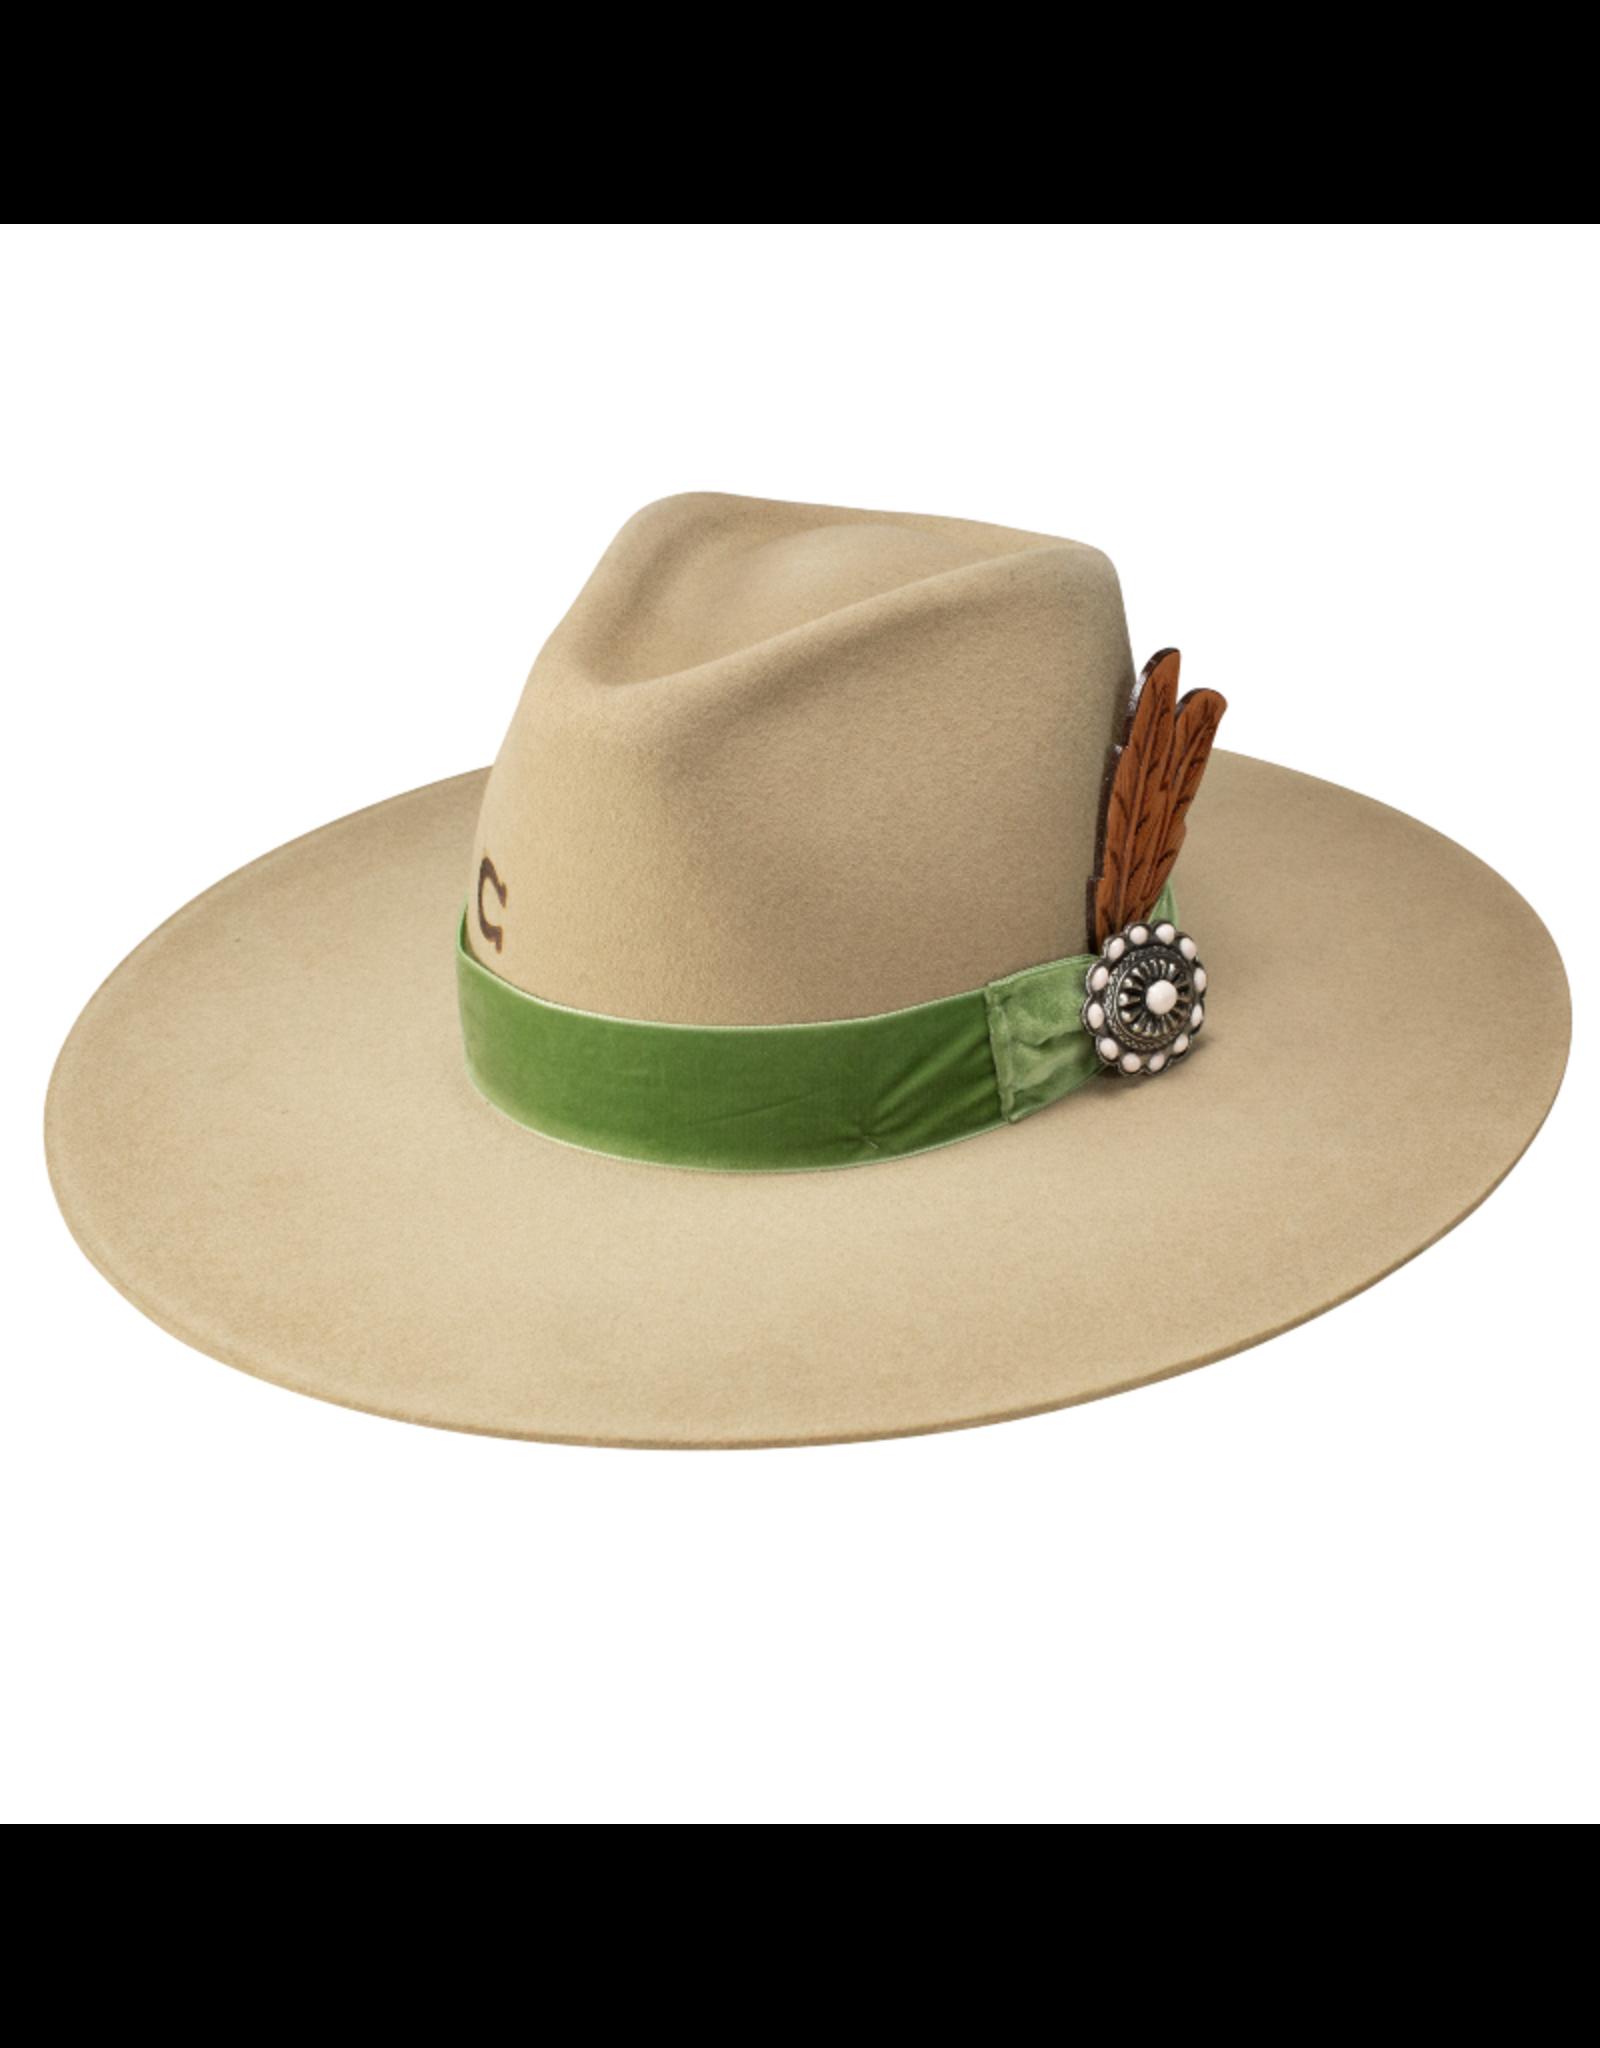 Stetson Hats Stetson Charlie 1 Horse Hippie Hat